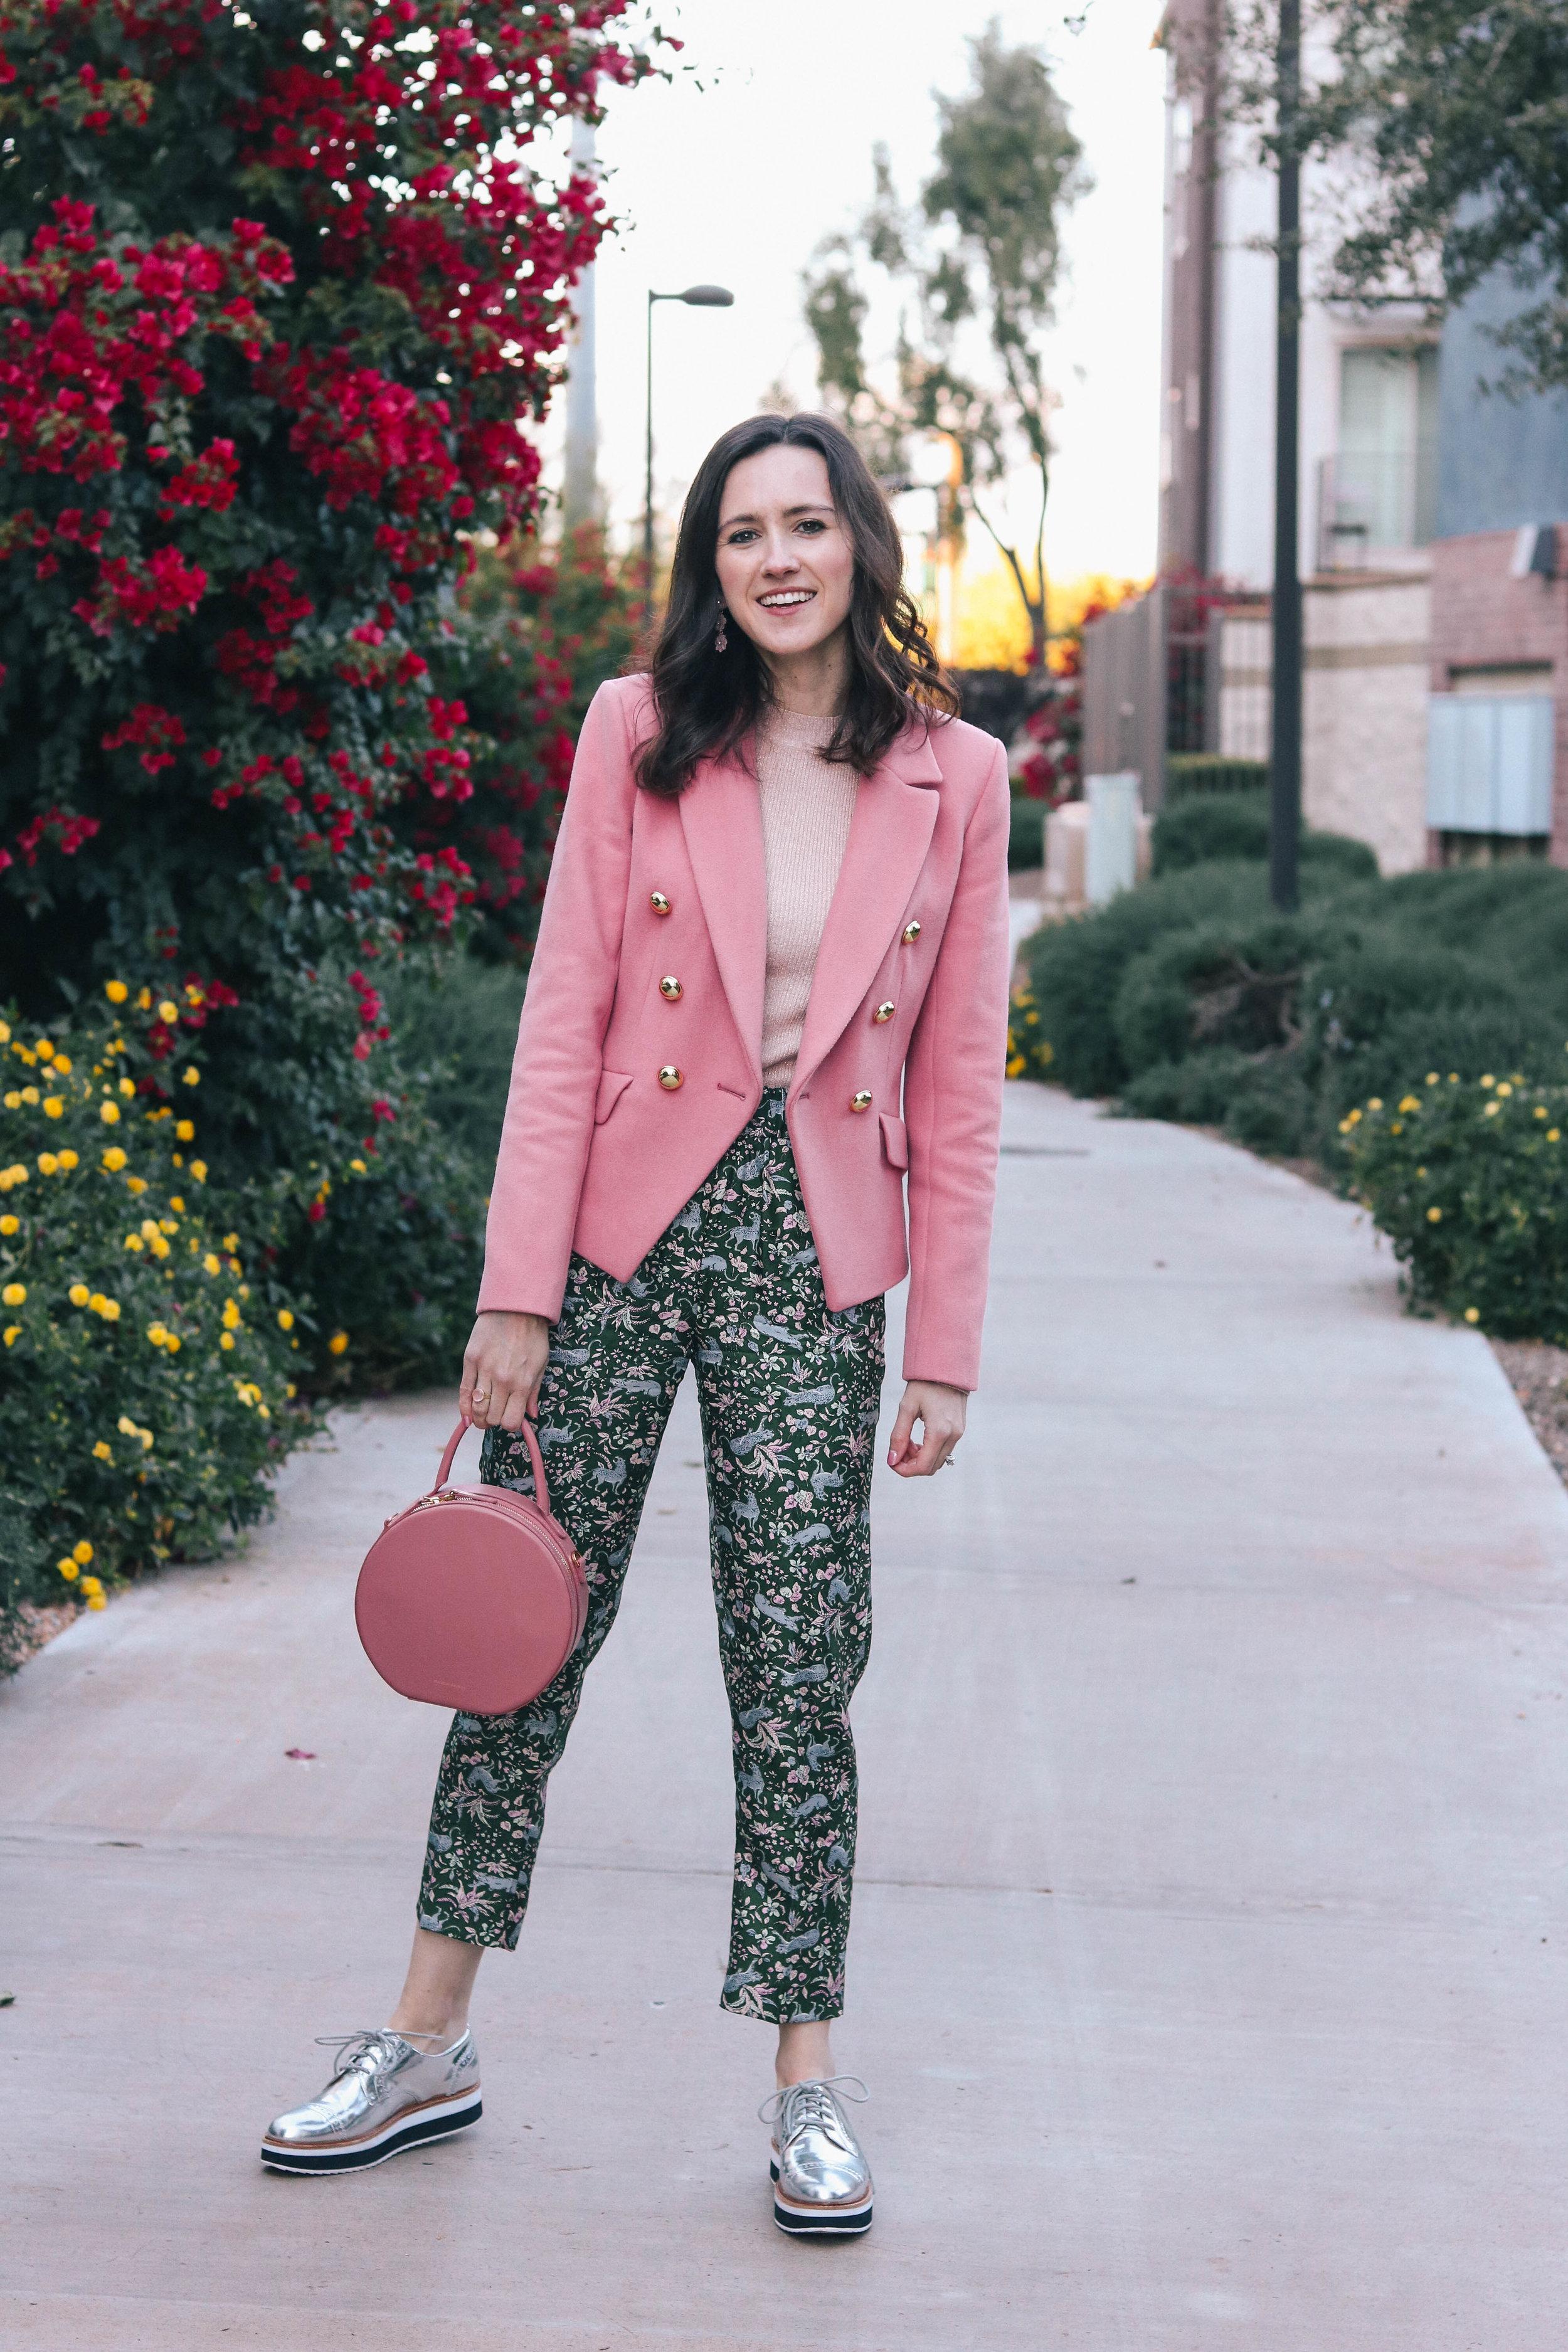 bb-pink-green-florals (1 of 1).jpg